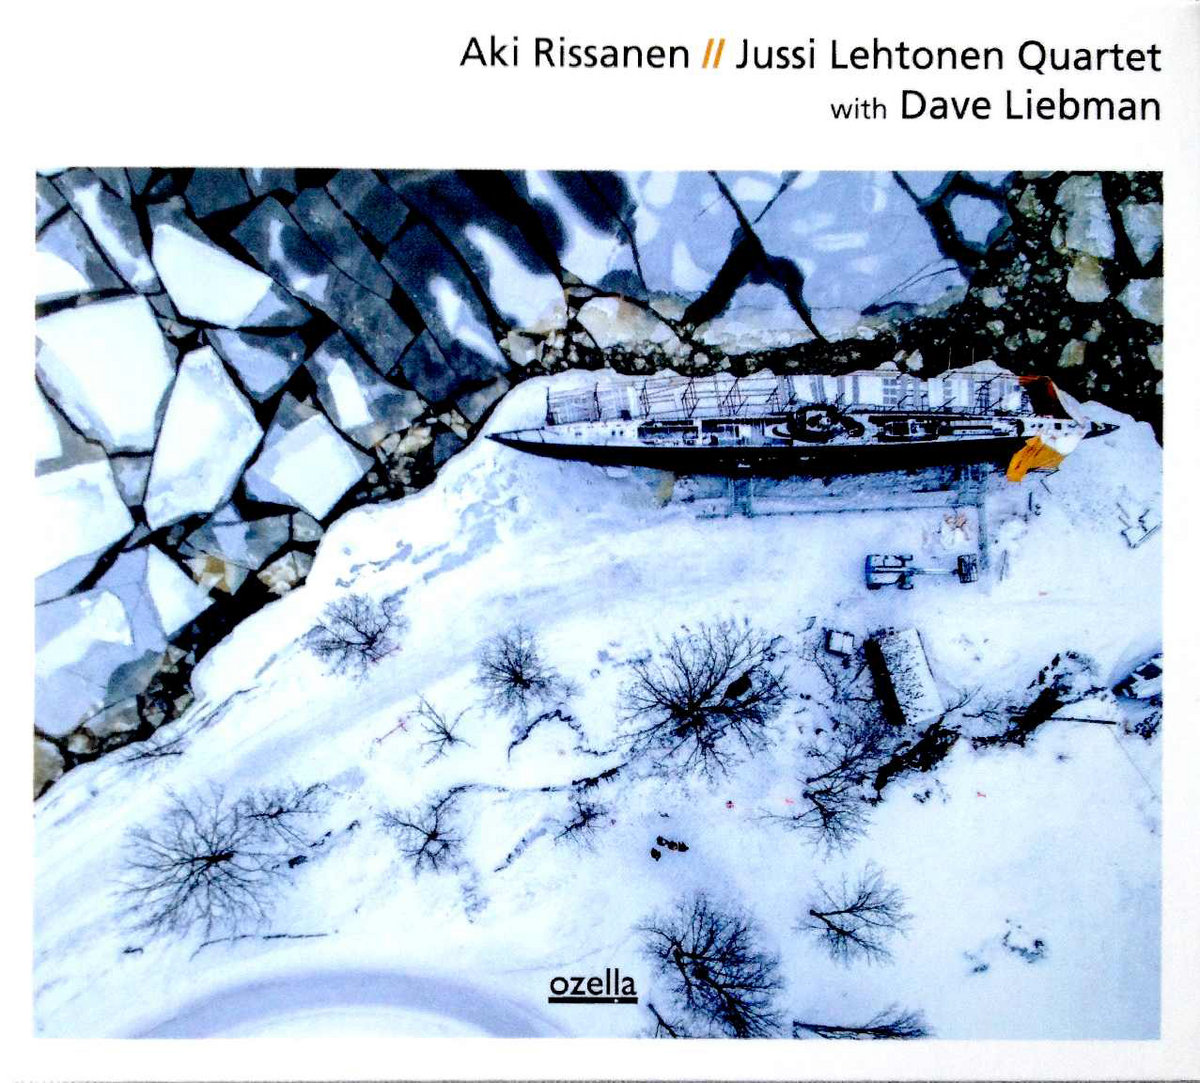 Aki Rissanen // Jussi Lehtonen Quartet with Dave Liebman | Eclipse Music Official Store